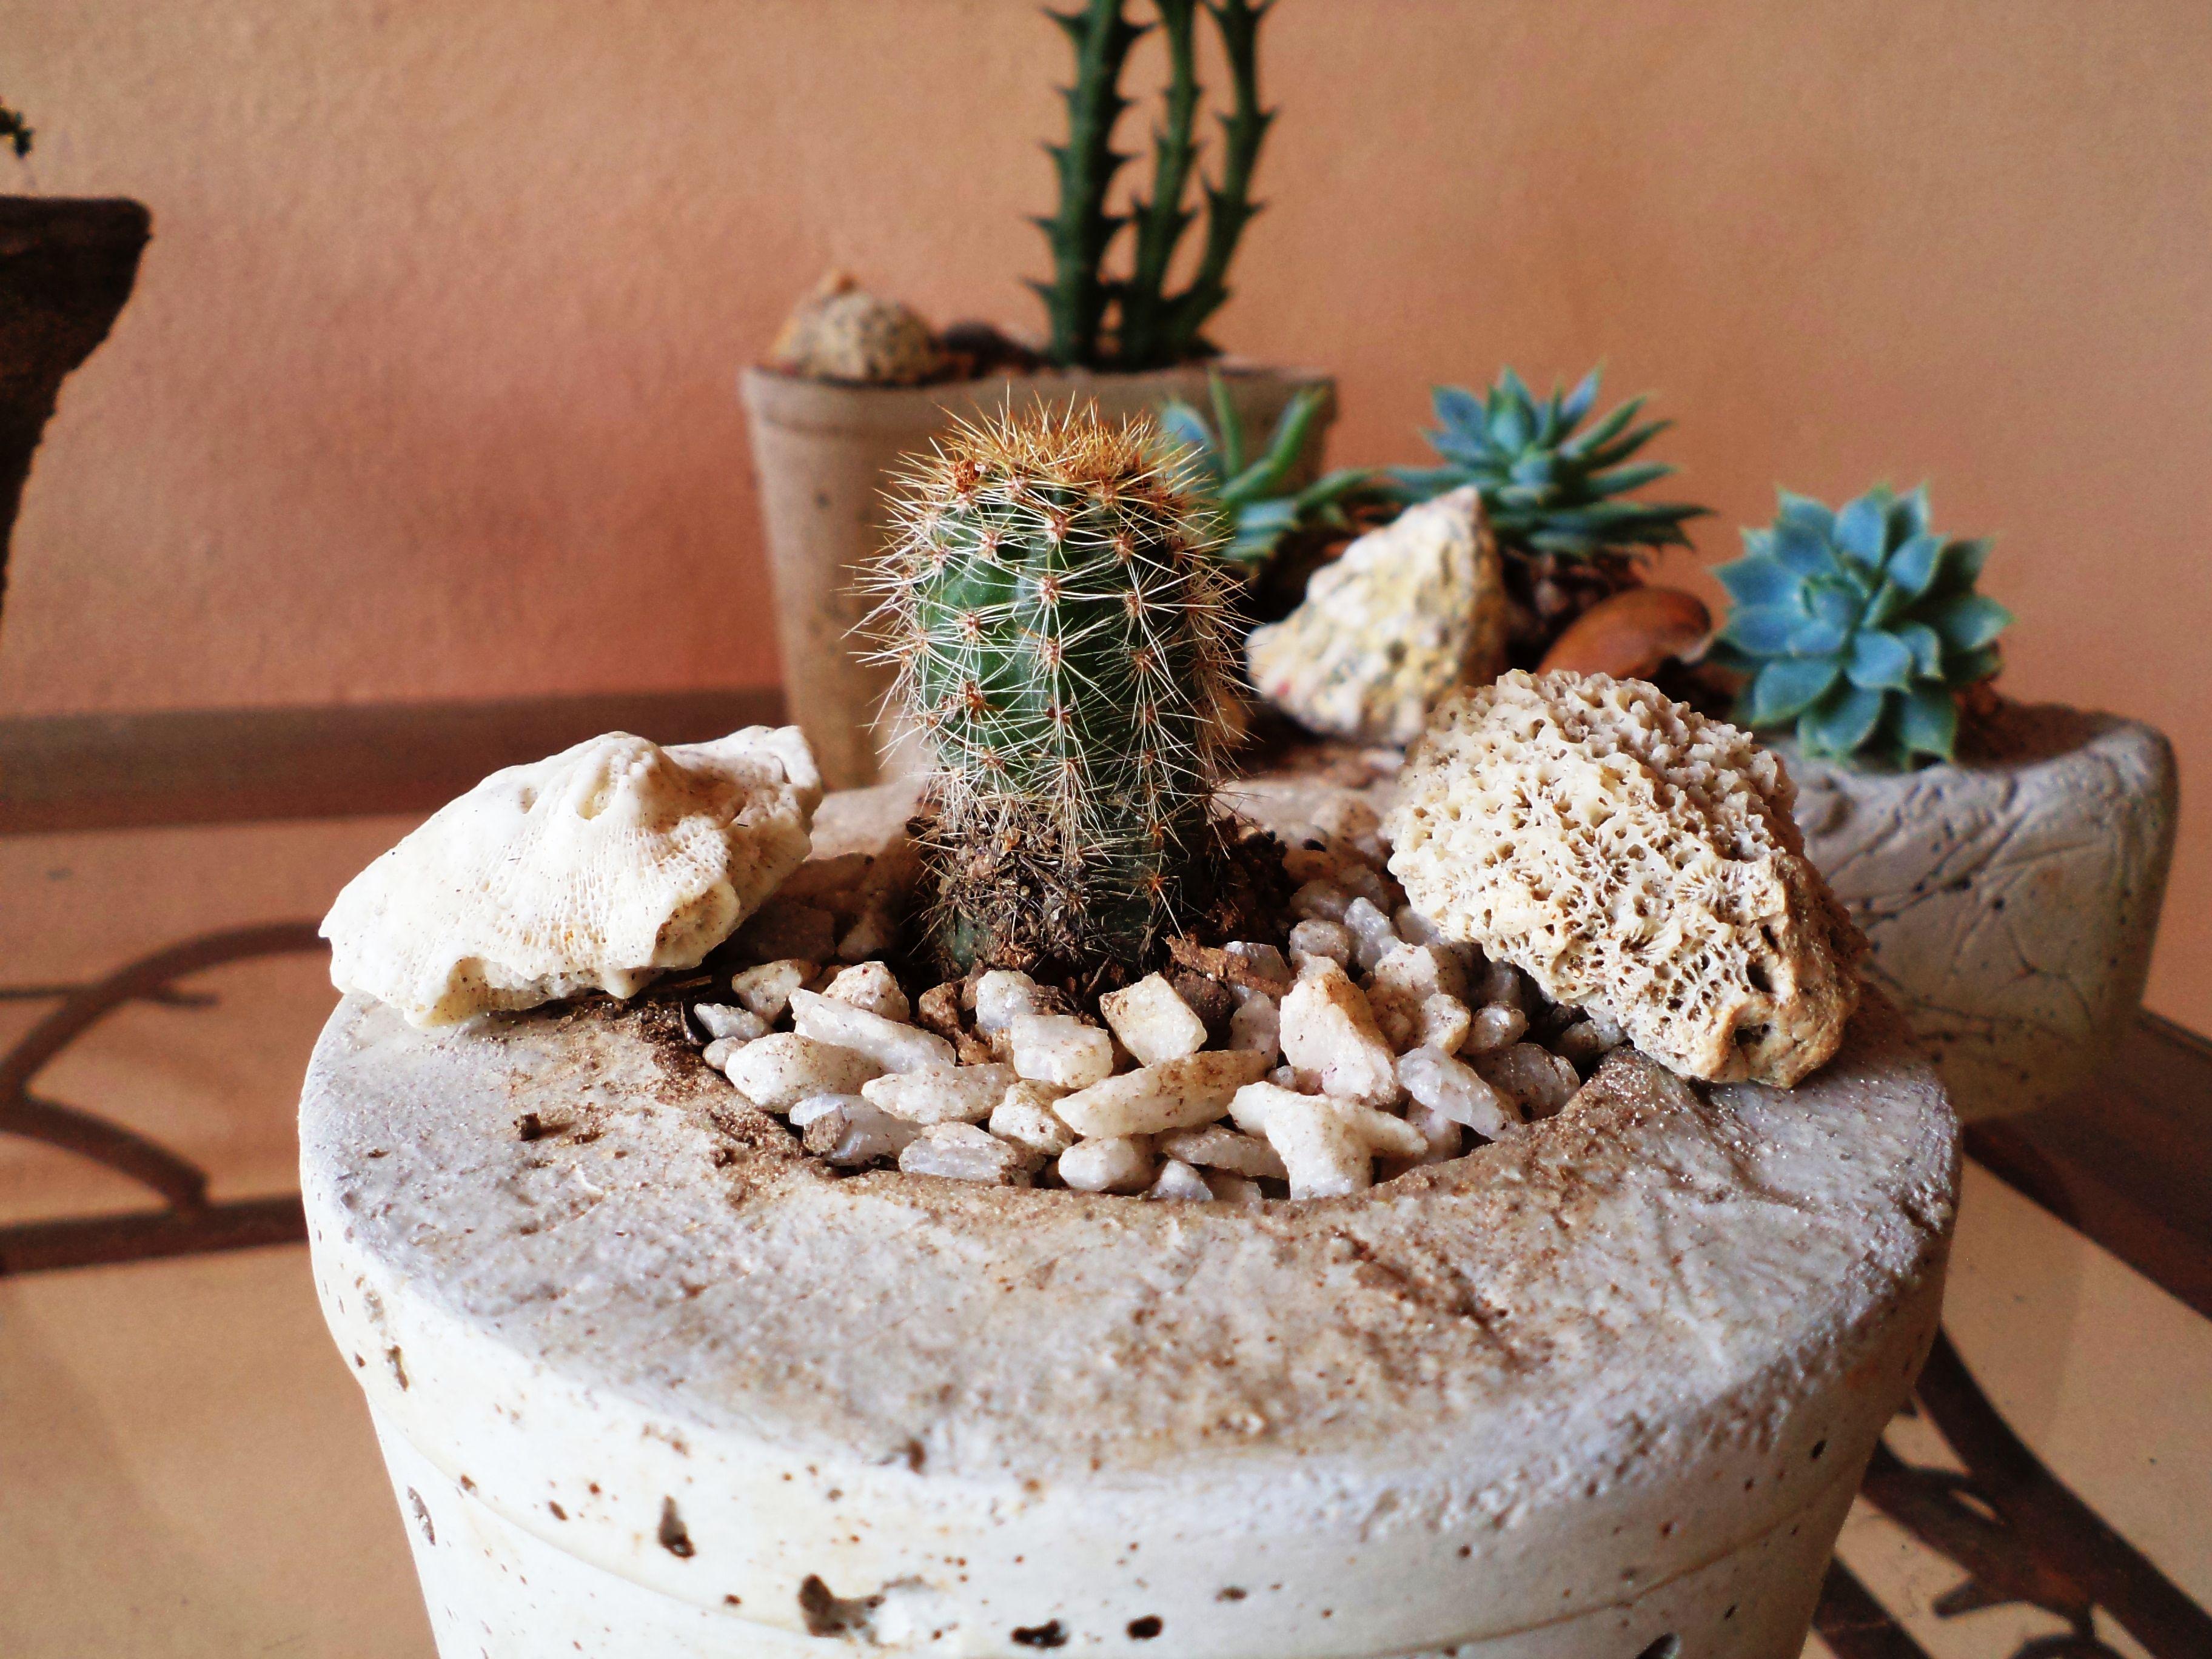 Jardim de suculenta em vaso de cimento.